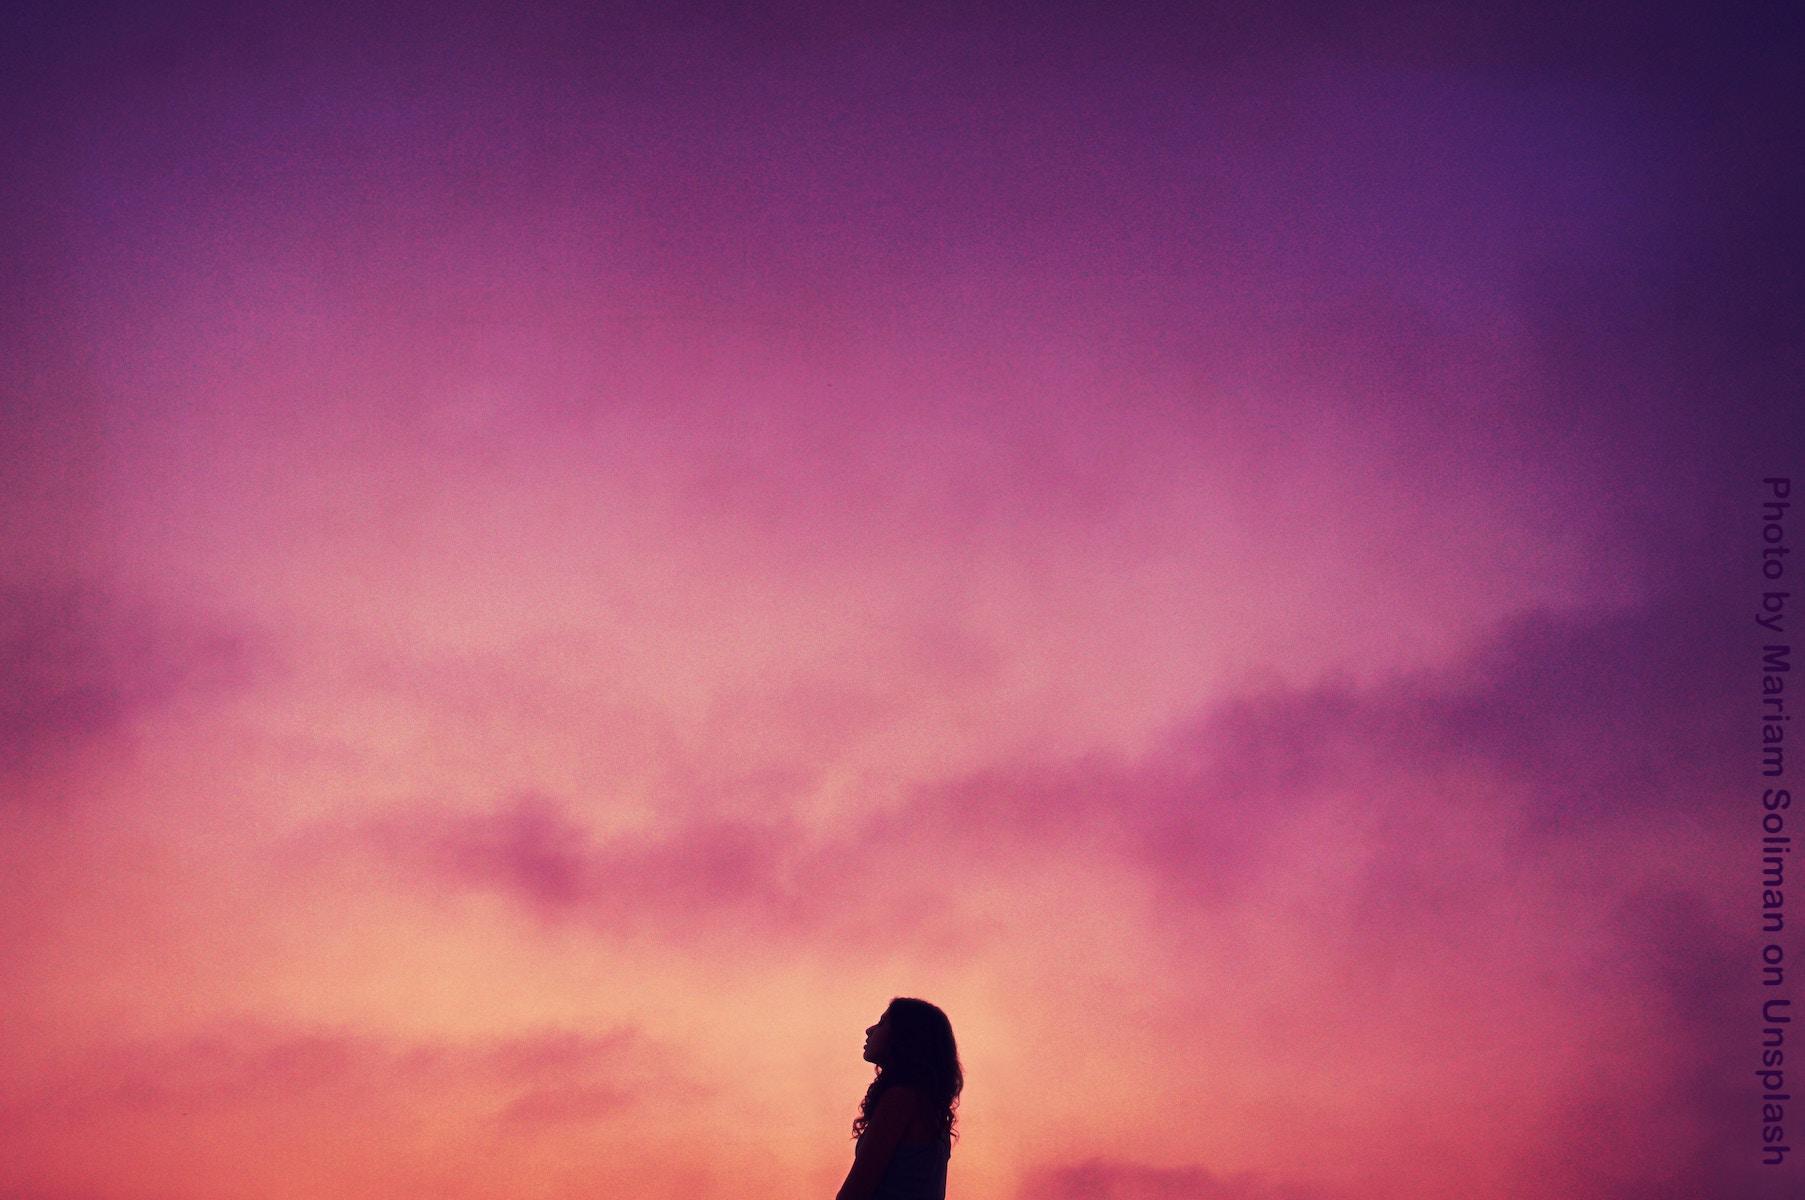 queen of pentacles, tarot, death, mayan, daykeeper, lamat, creativity, growth, reproduce, potential, healingthroughceremony.com, michele fire-river heart